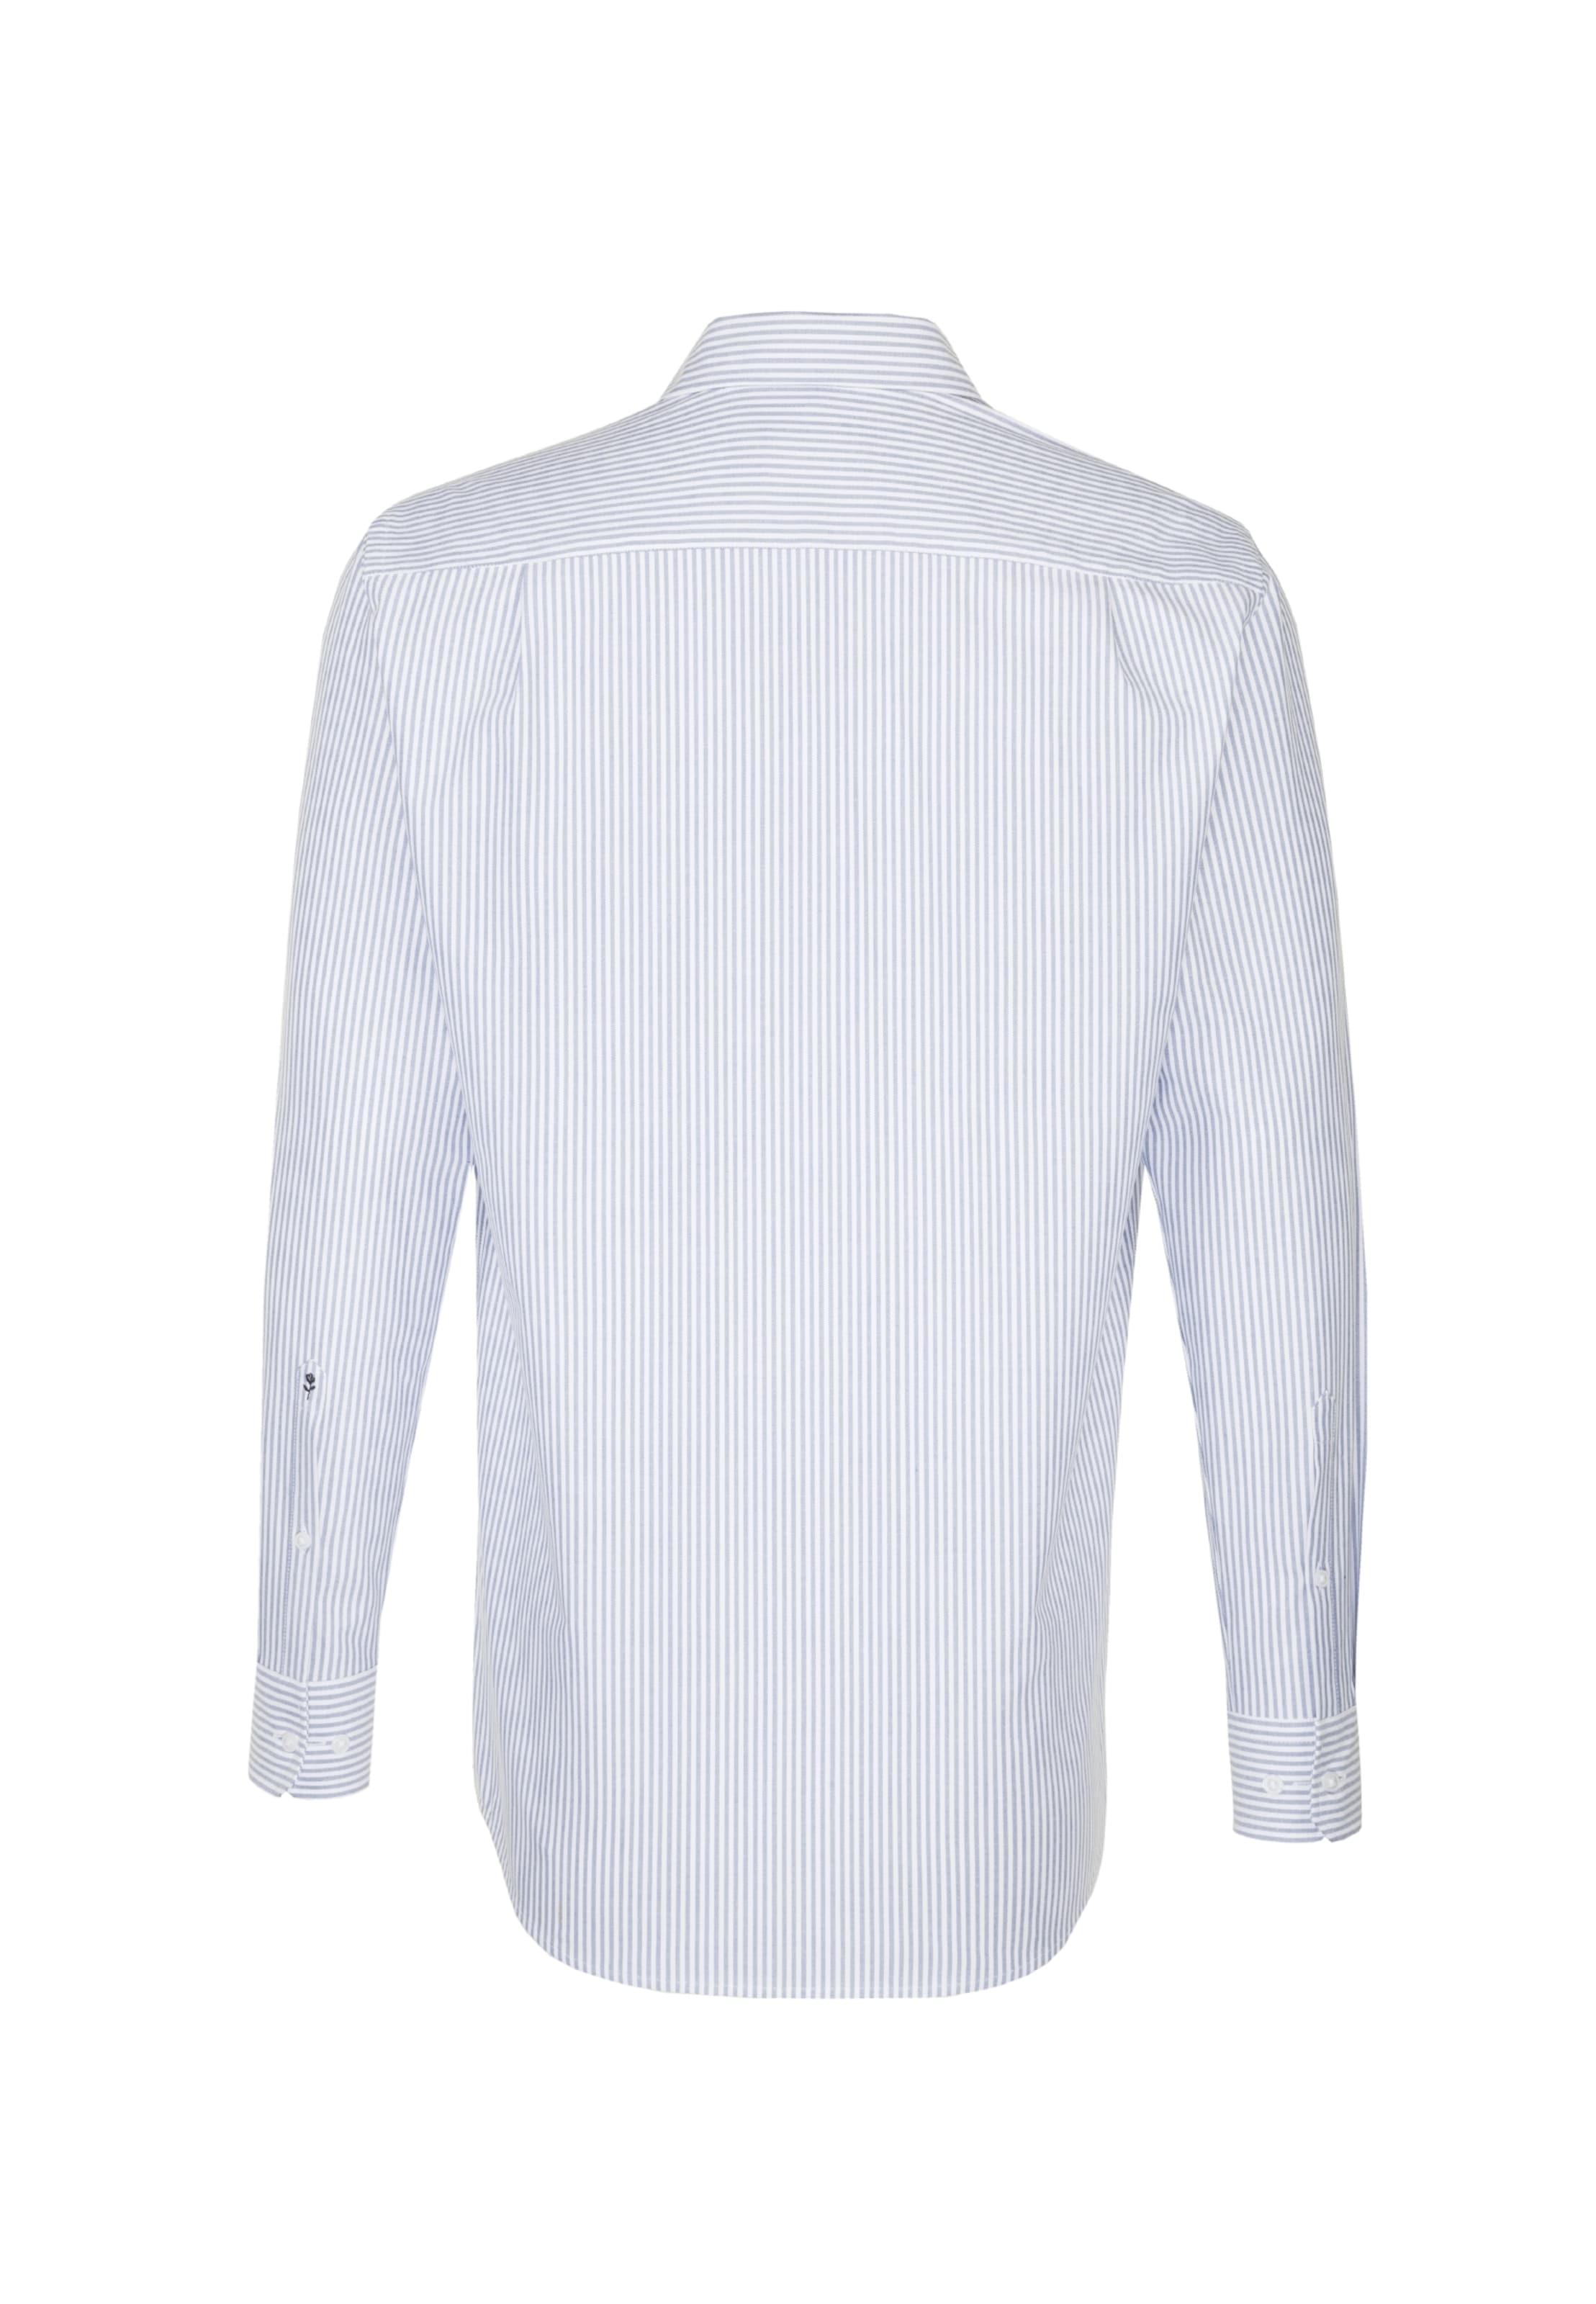 Hemd In Seidensticker Seidensticker In Hemd HellblauWeiß Hemd Seidensticker In HellblauWeiß WDEI9H2